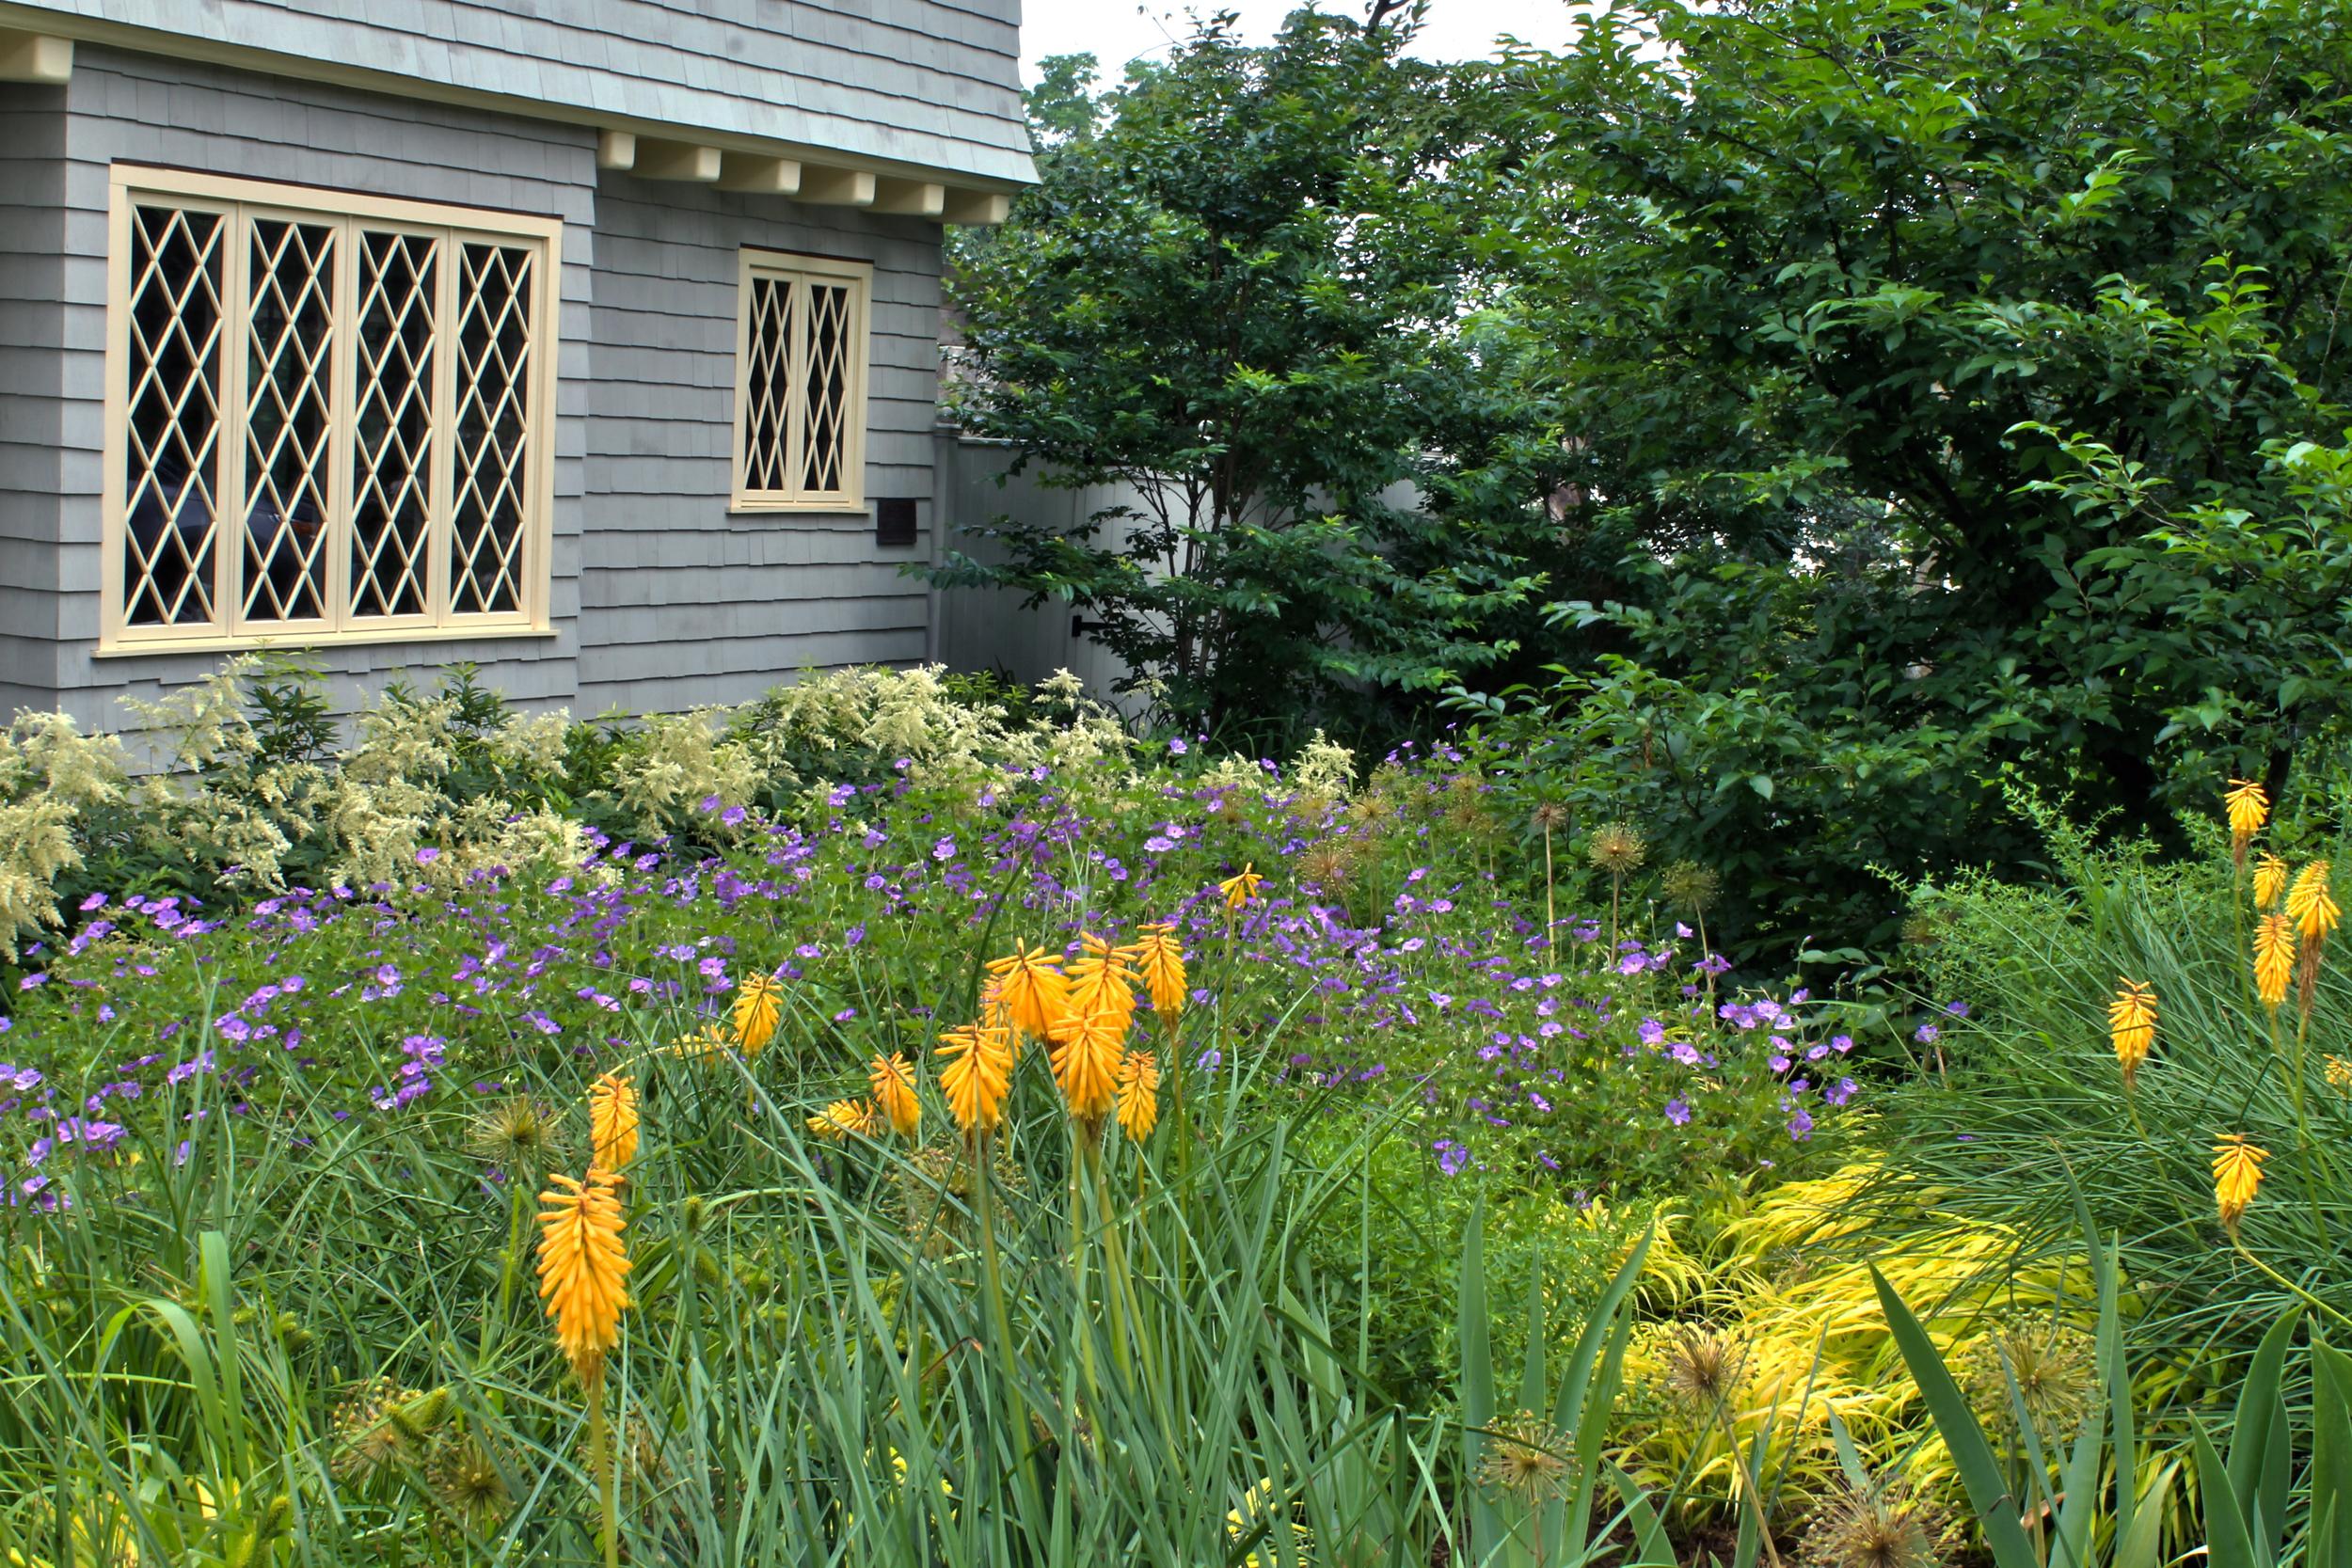 Kniphofia, geranium and aruncus in colorful planting arrangement